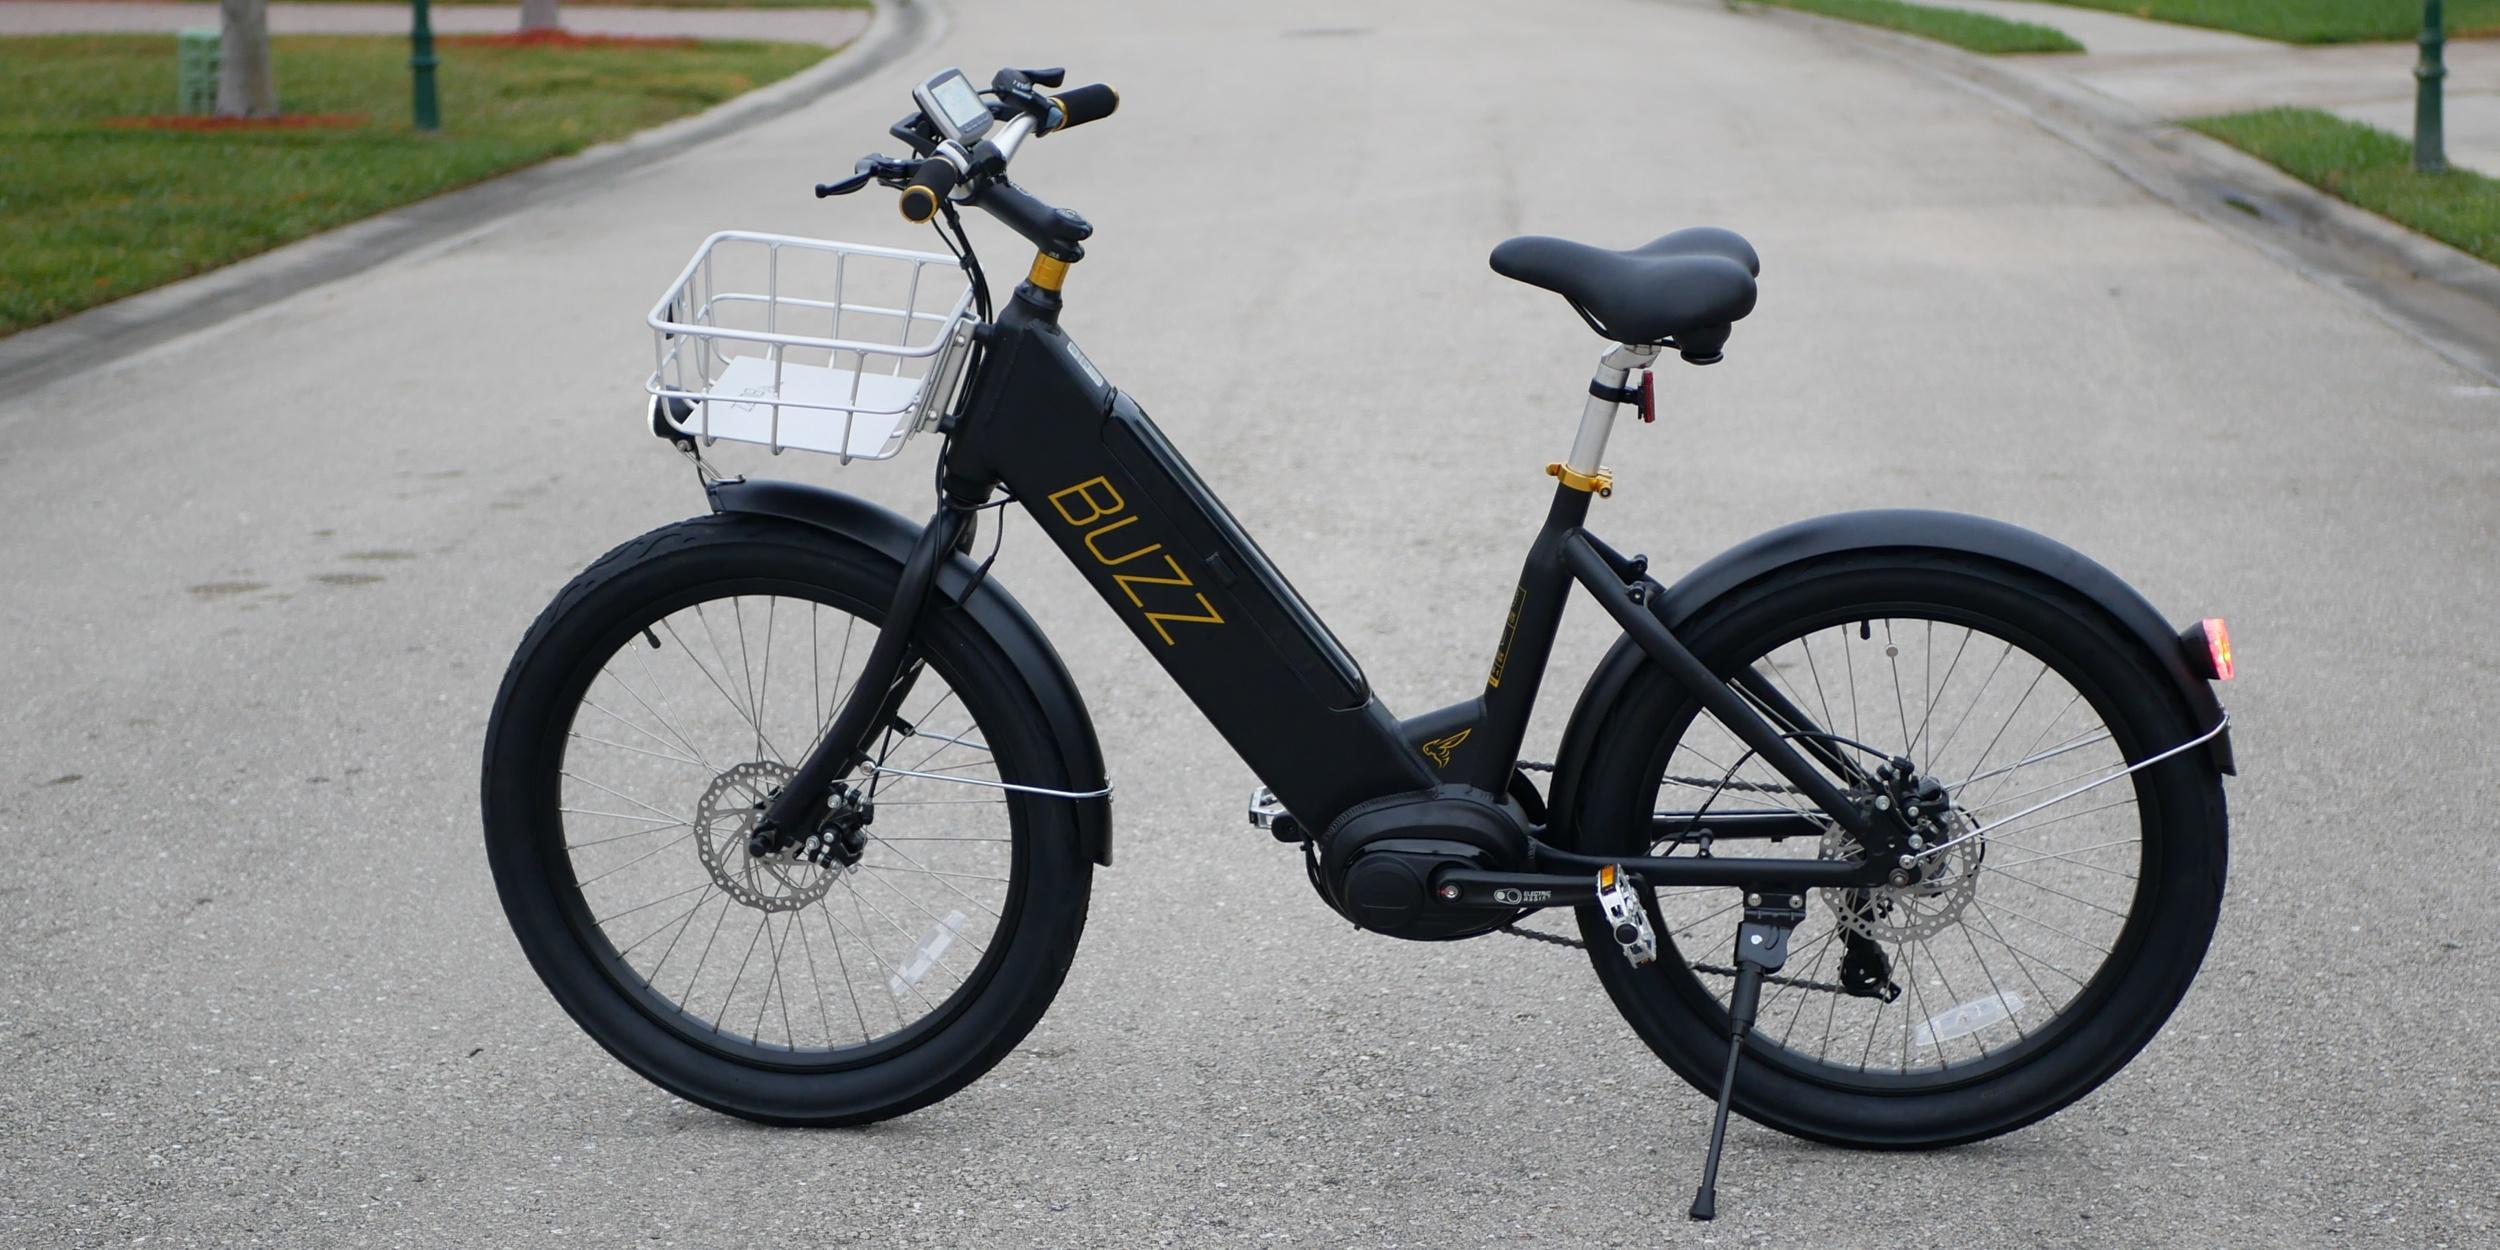 New Bicycle Speed Sensor Torque Sensor For Tongsheng TSDZ2 Mid Drive Motor Black